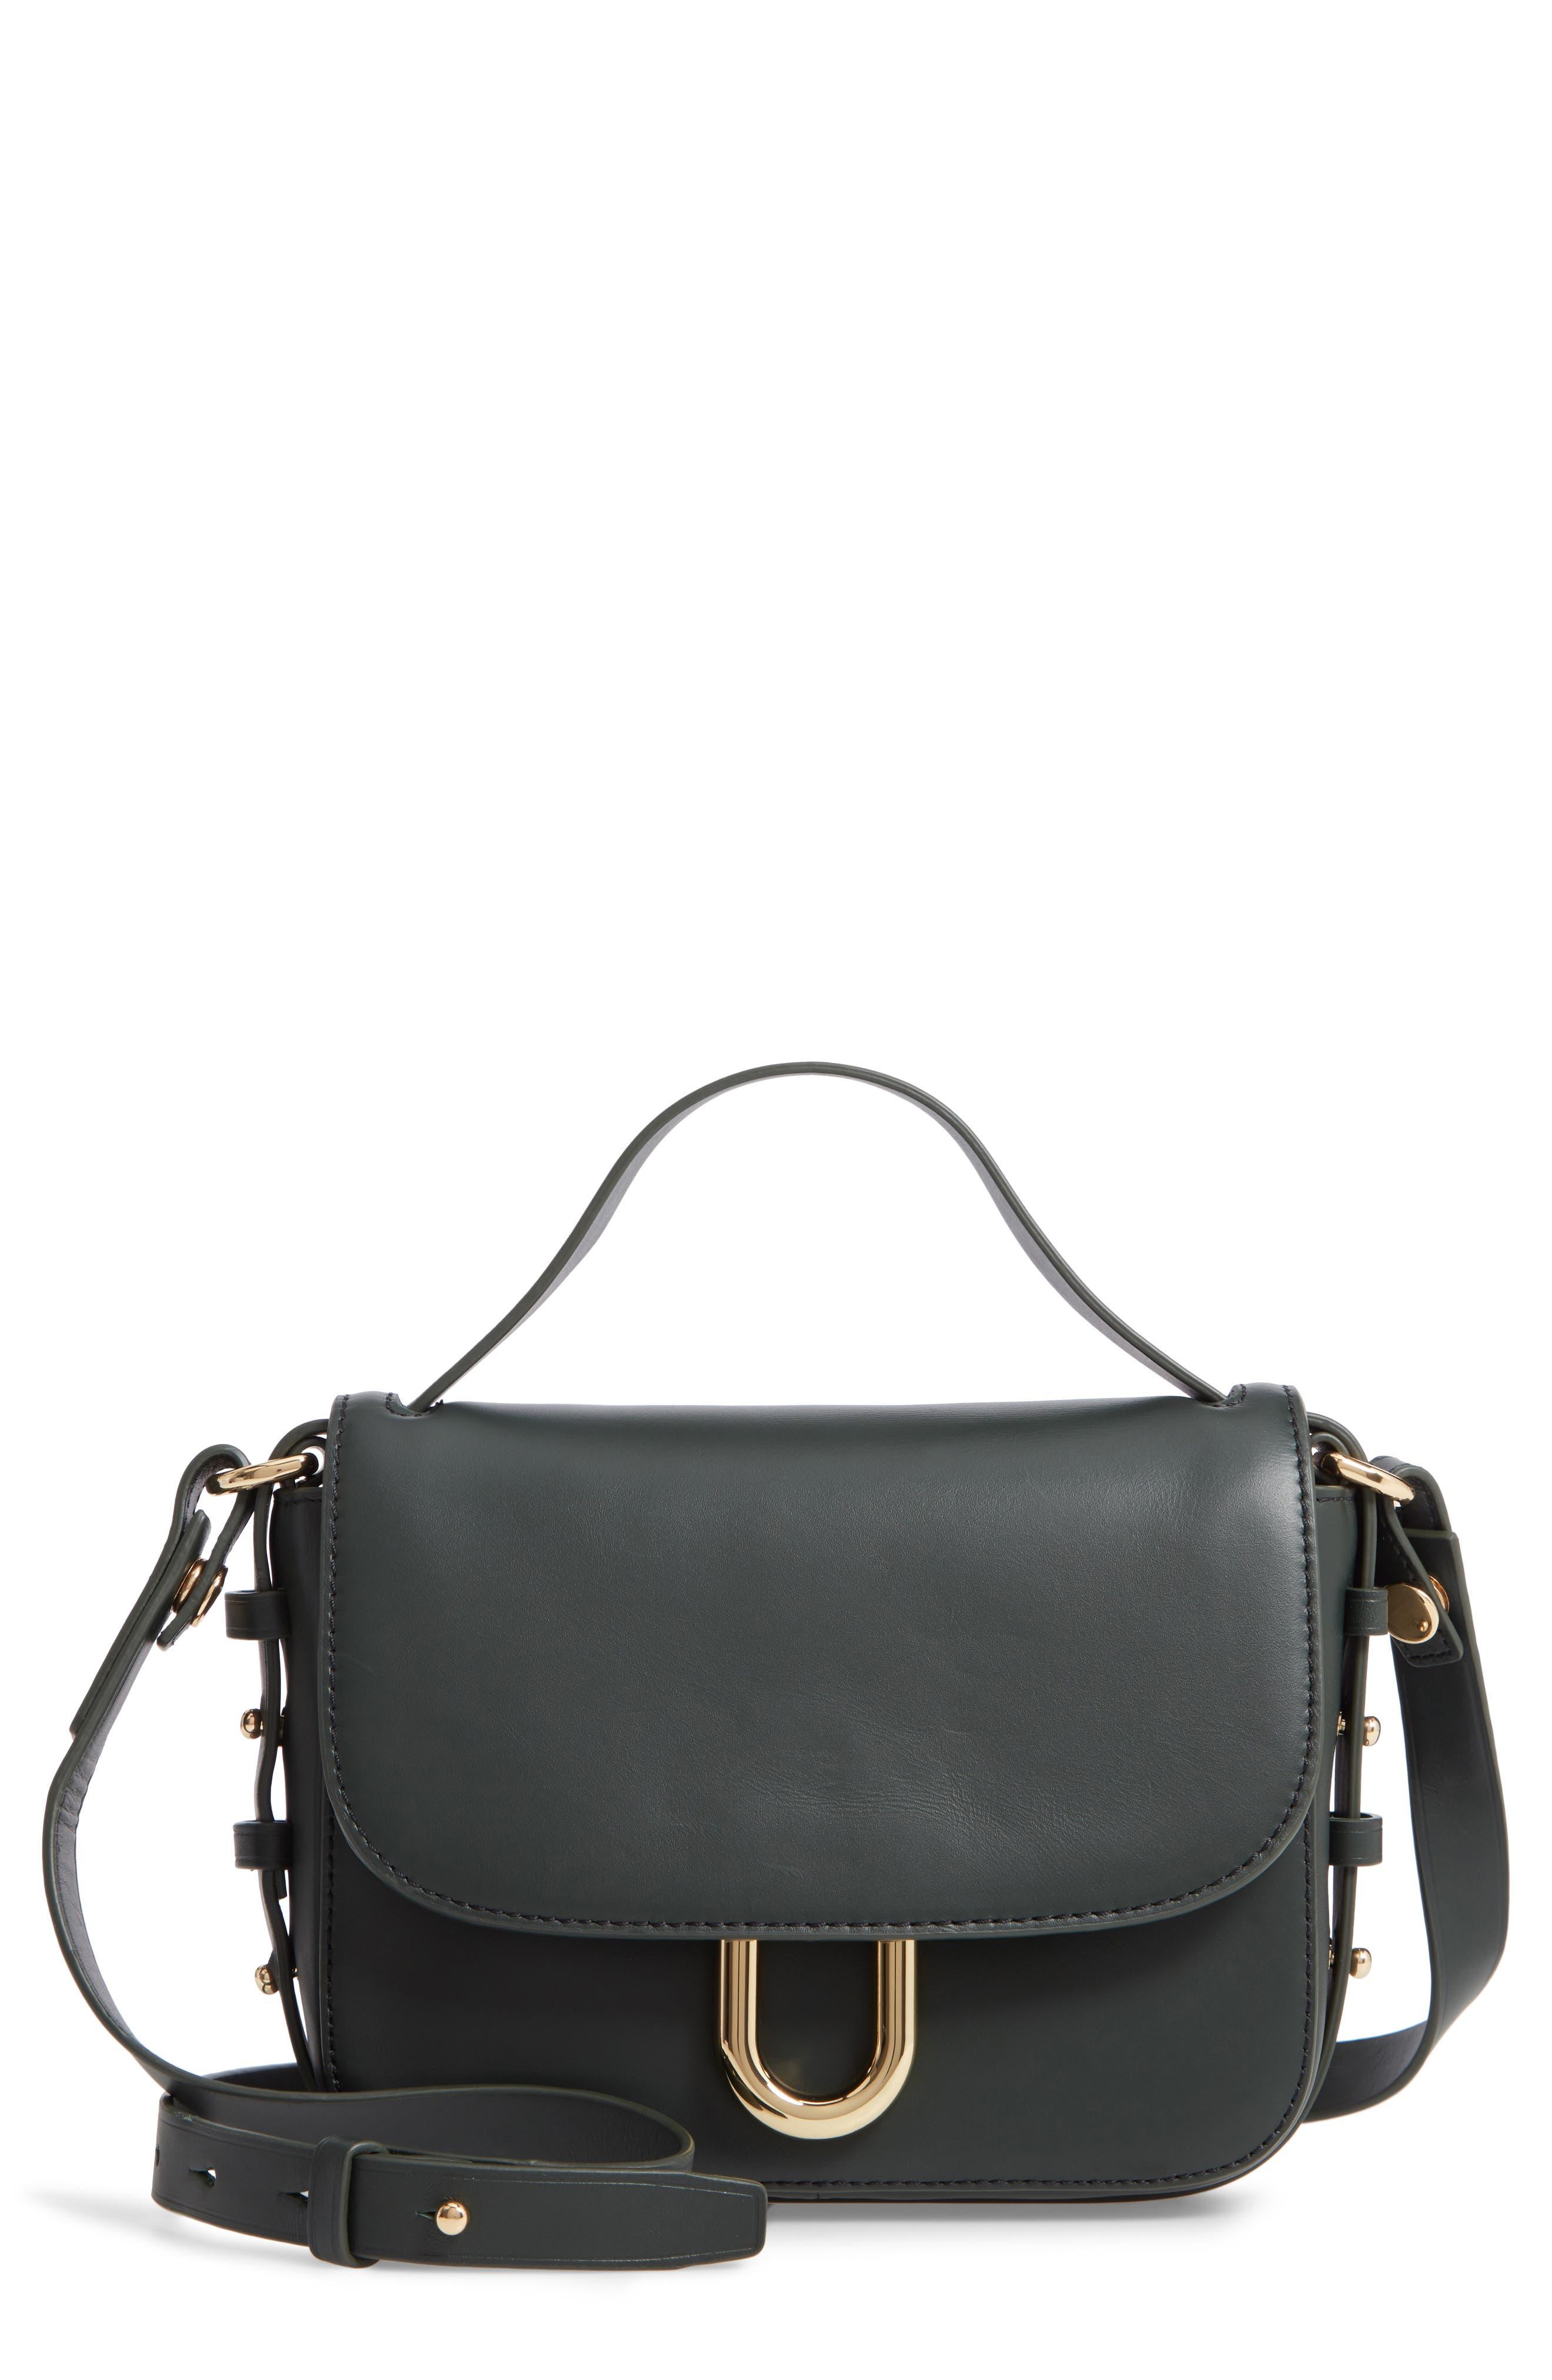 Harper Leather Crossbody Bag, Main, color, DARK EVERGREEN